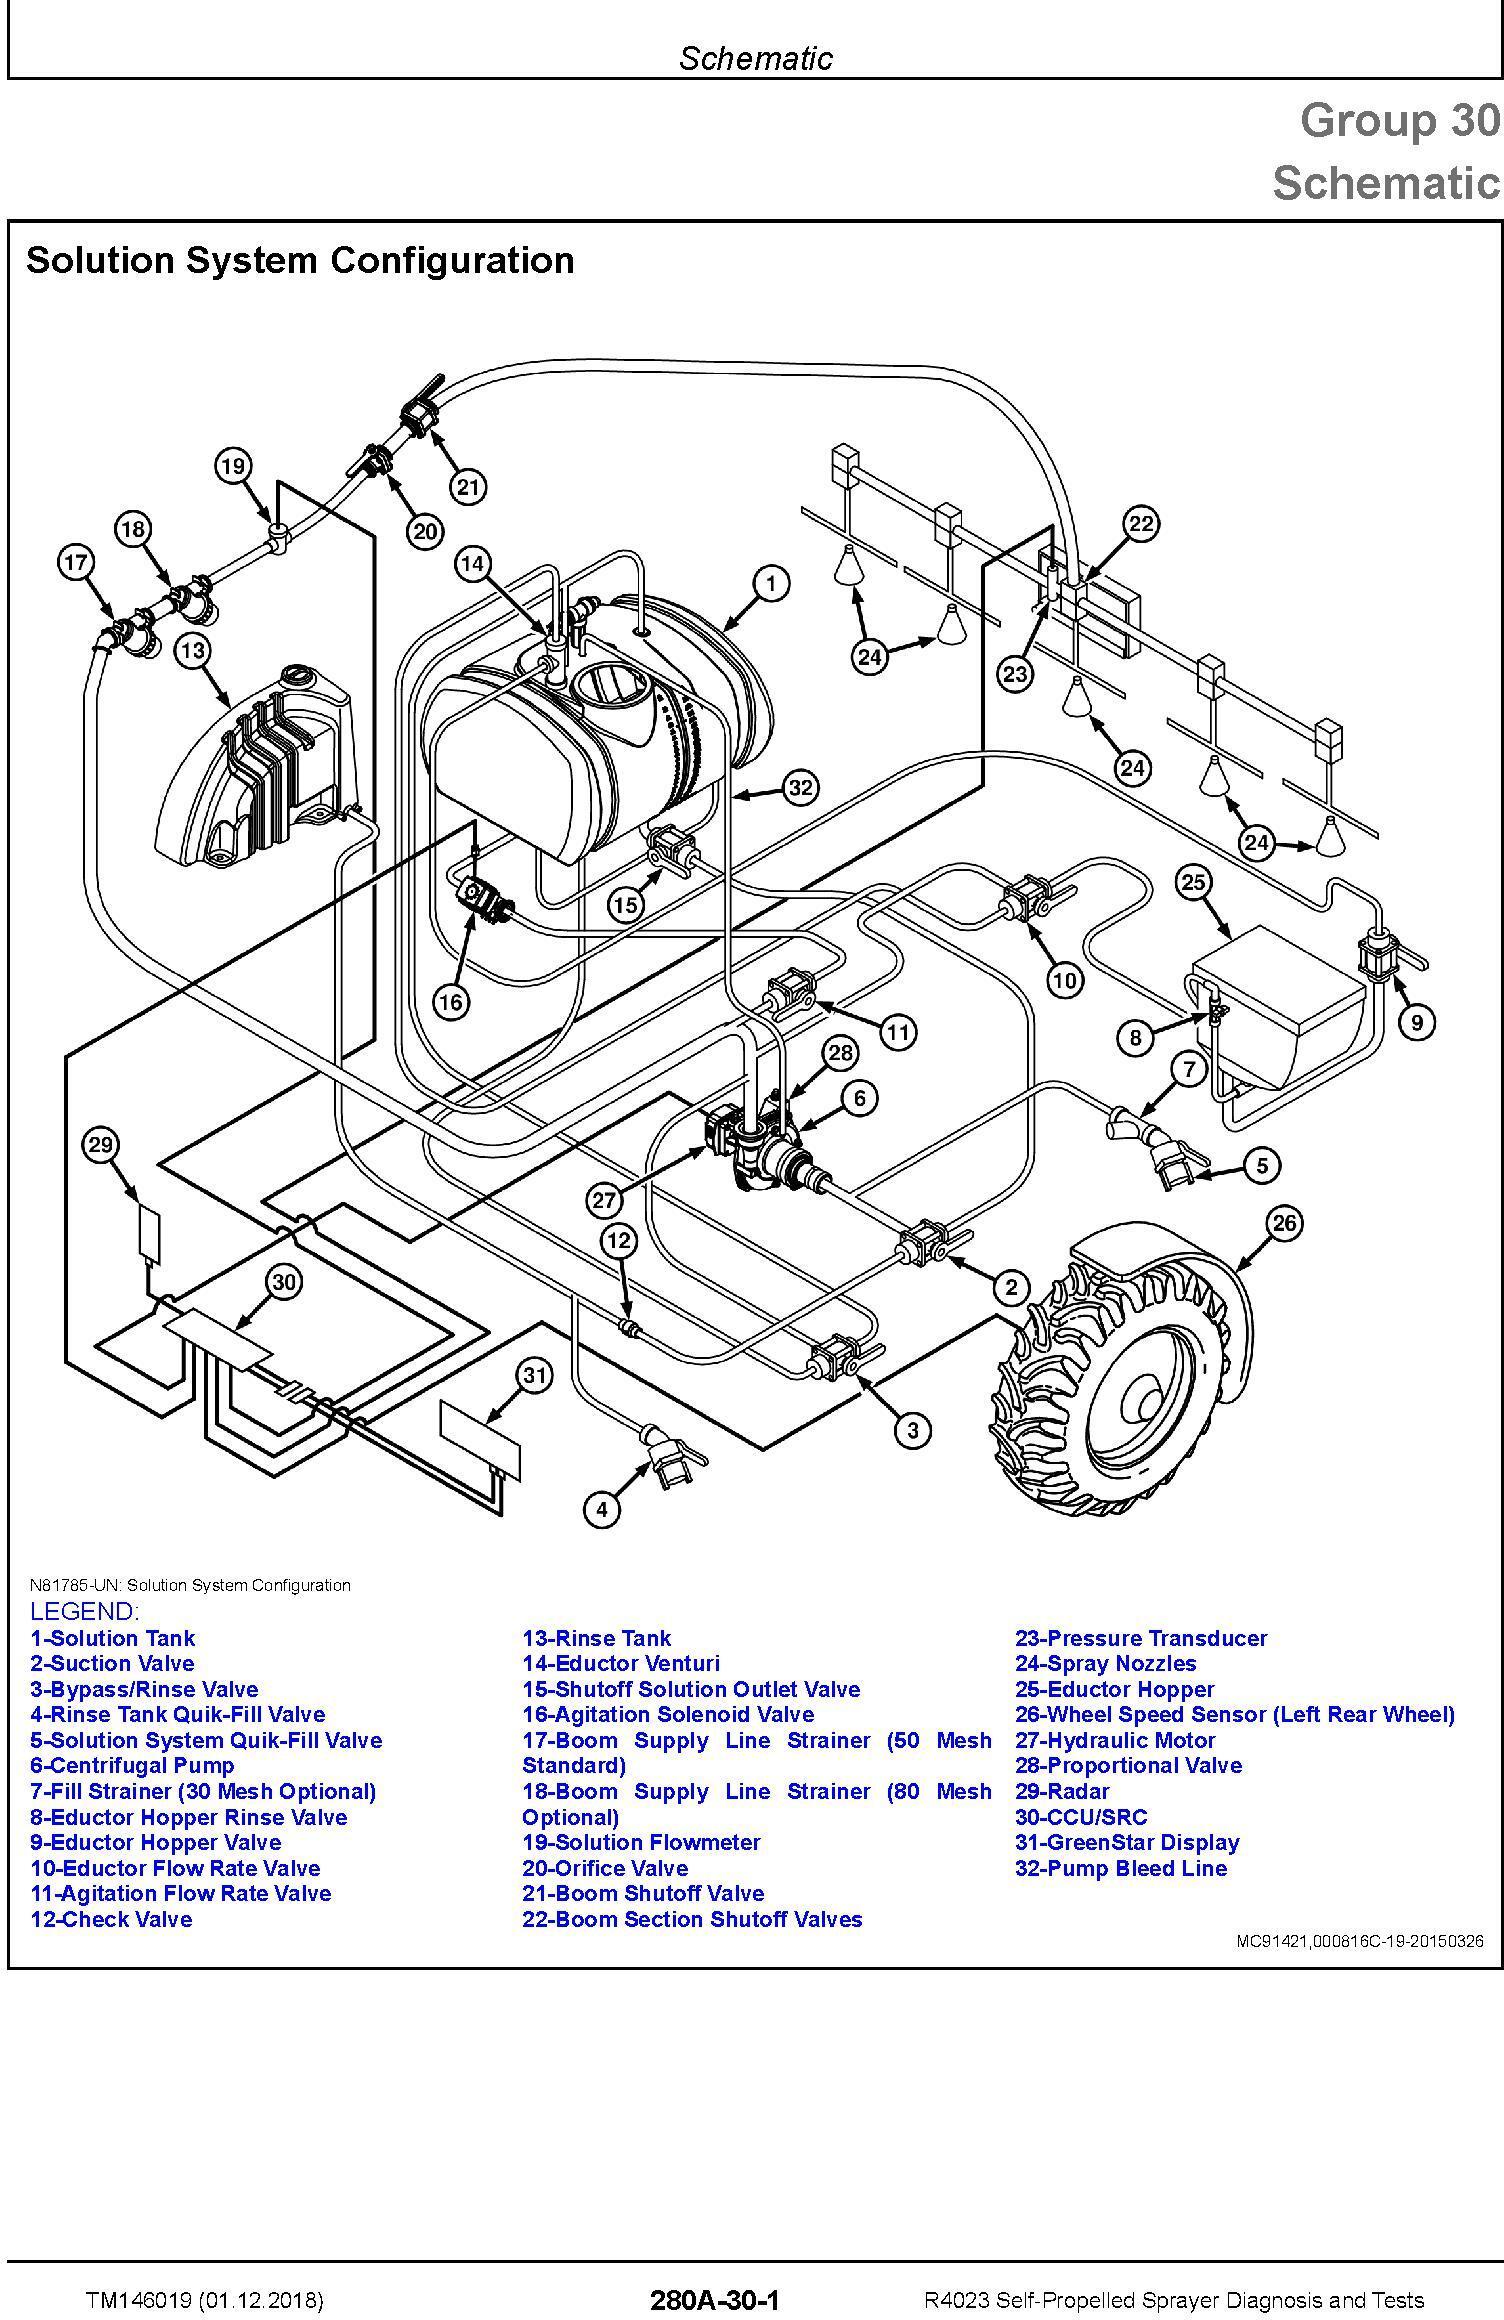 John Deere R4023 Self-Propelled Sprayer (SN. 180001-) Diagnostic Technical Manual (TM146019) - 1